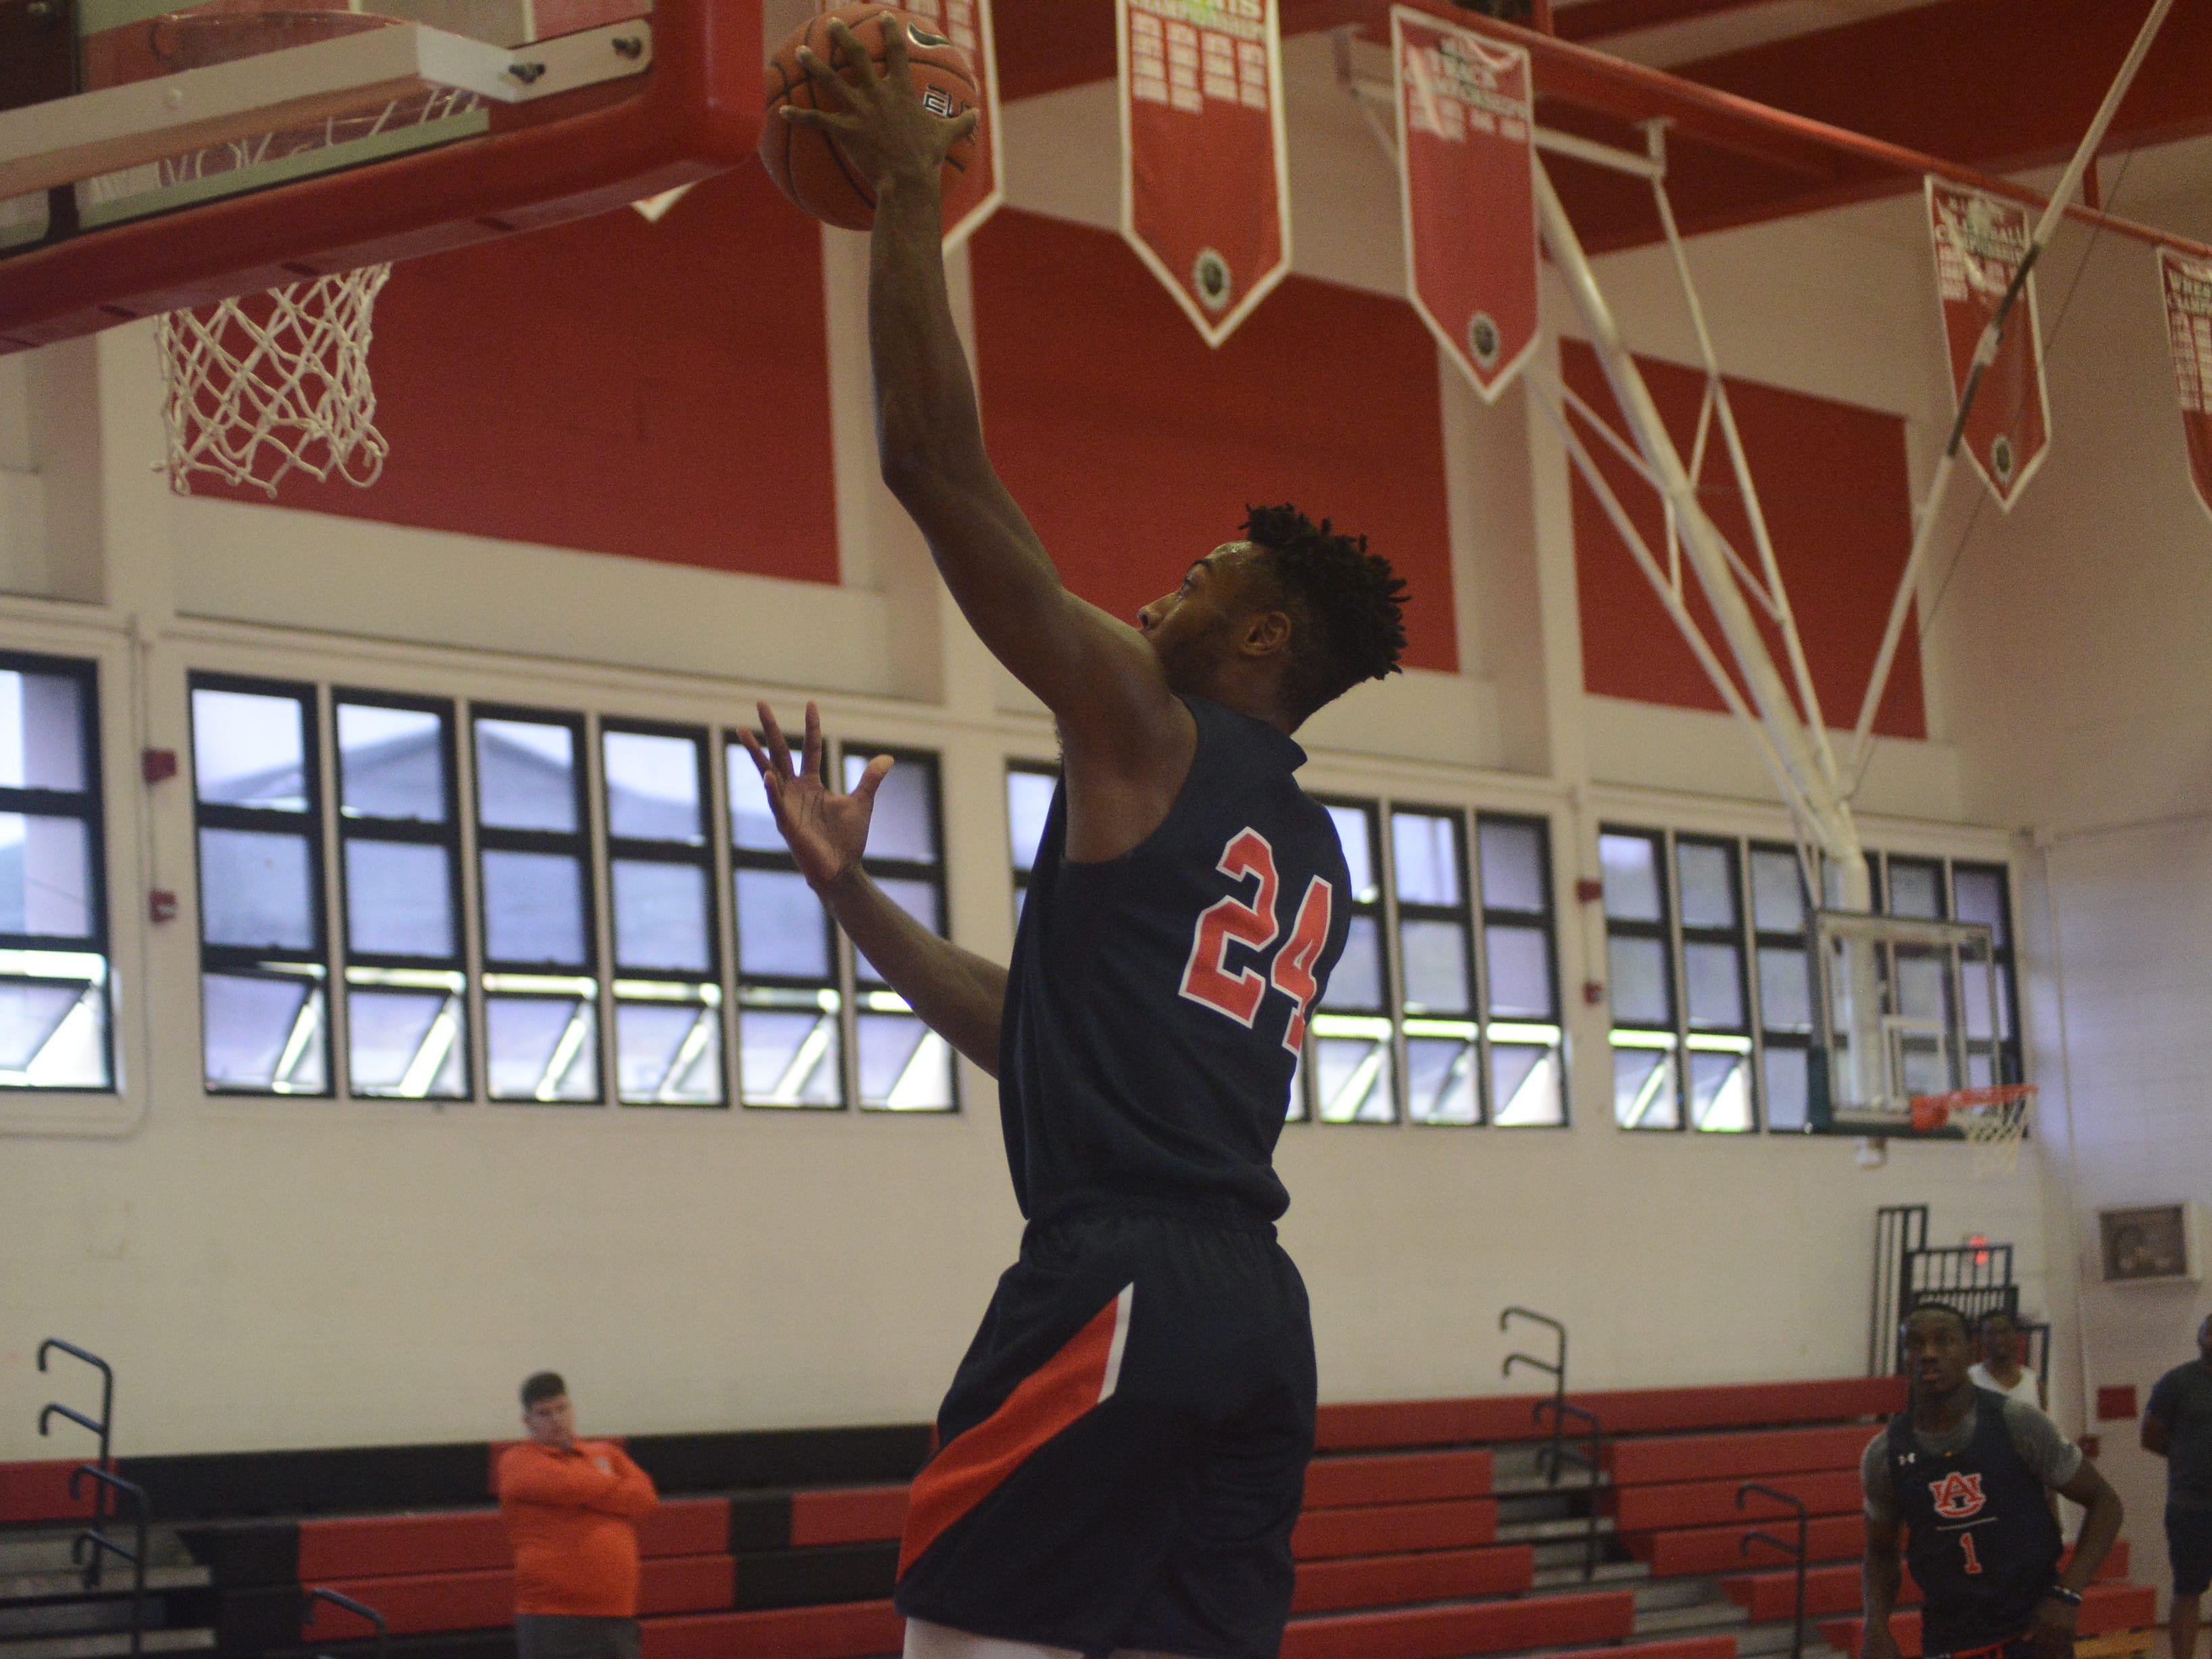 Auburn forward Anfernee McLemore during practice in Maui.